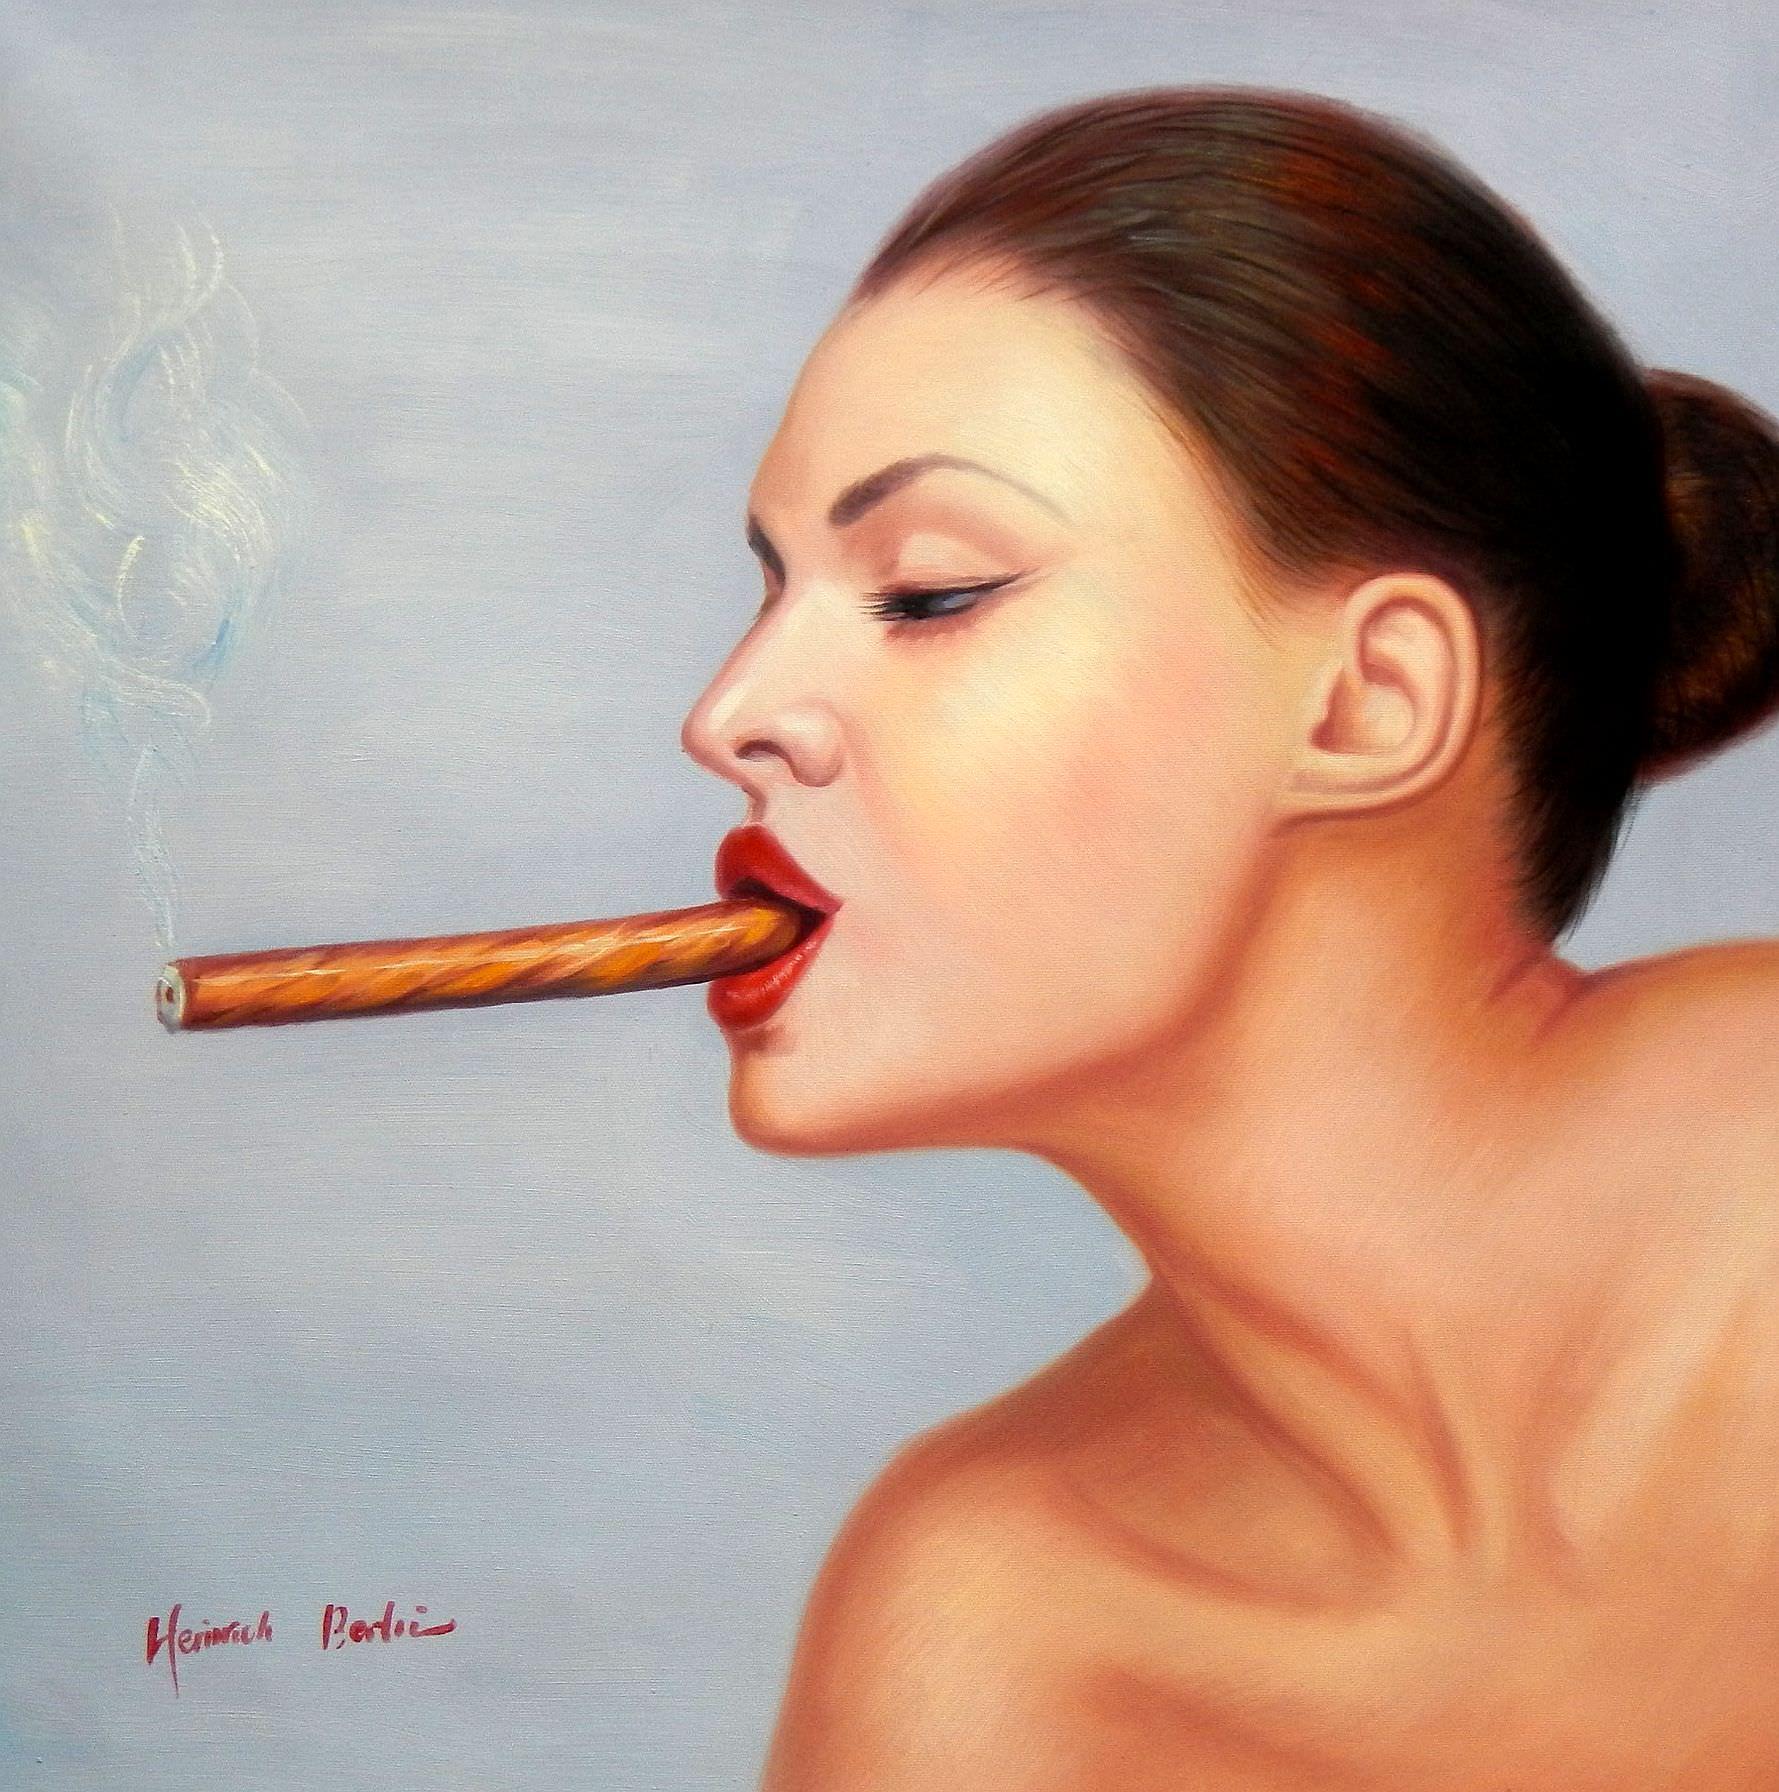 Modern Art - Frau mit Cohiba Zigarre e95797 60x60cm exquisites Ölgemälde